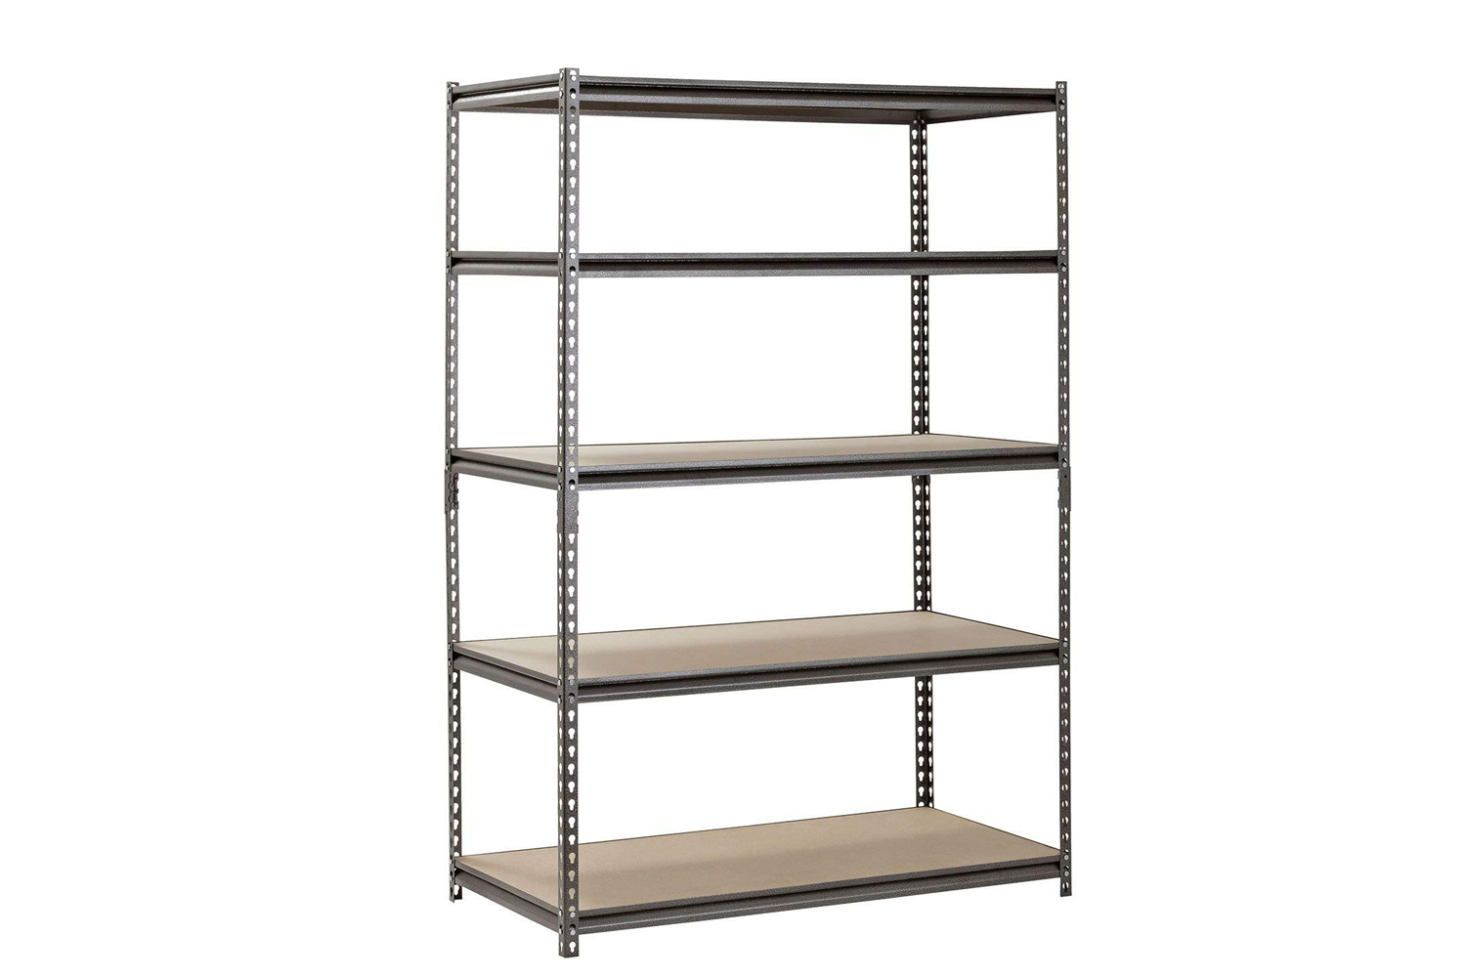 10 Easy Pieces Budget Garage Shelving Garage Shelving Shelves Garage Shelving Units